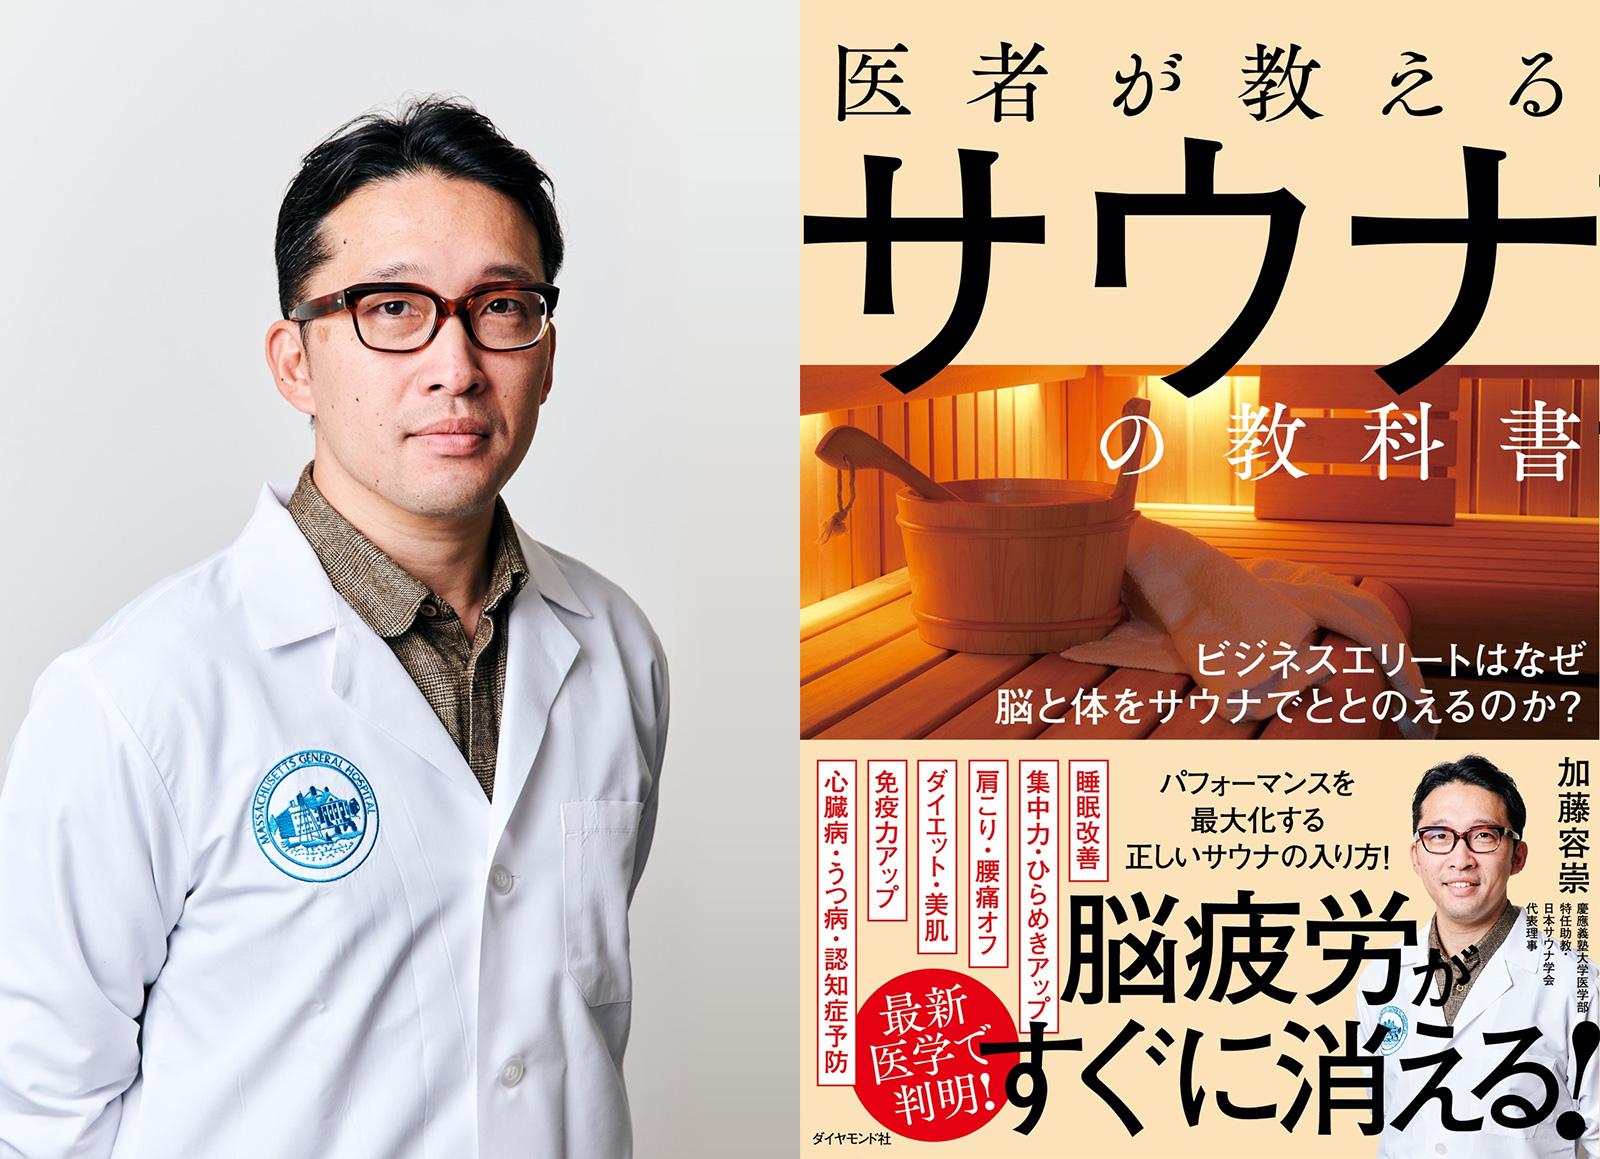 sauna ishi - 加藤容崇医師に正しいサウナの入り方をレクチャーしてもらった | 中だし種付けセックスより気持ちが良いサウナの入り方とは?